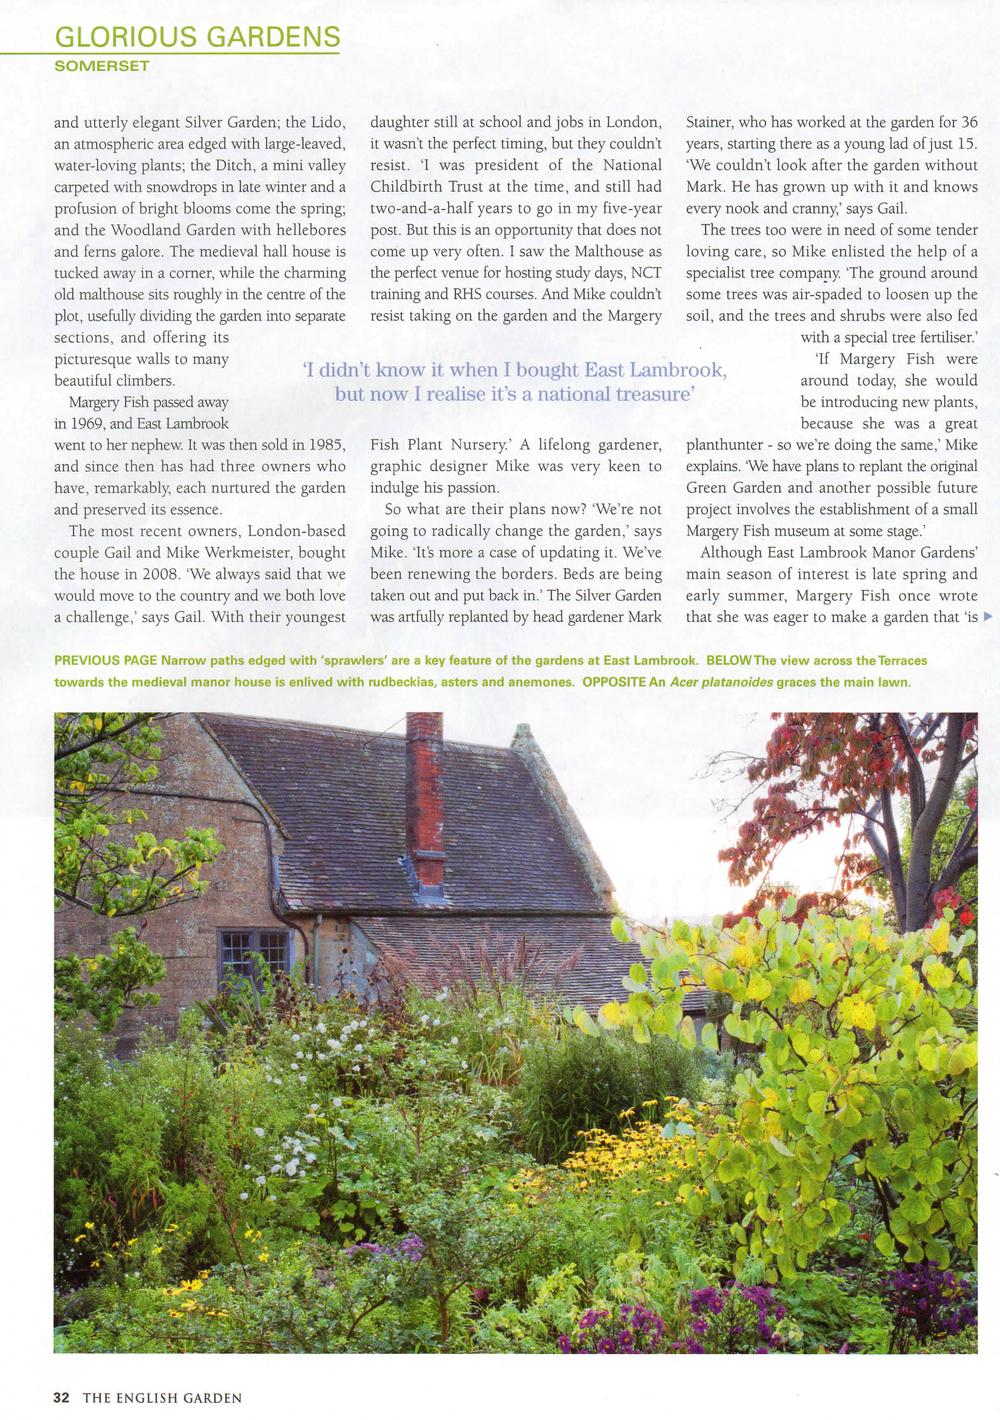 East Lambrook Mannor Gardens EG001-2.jpg